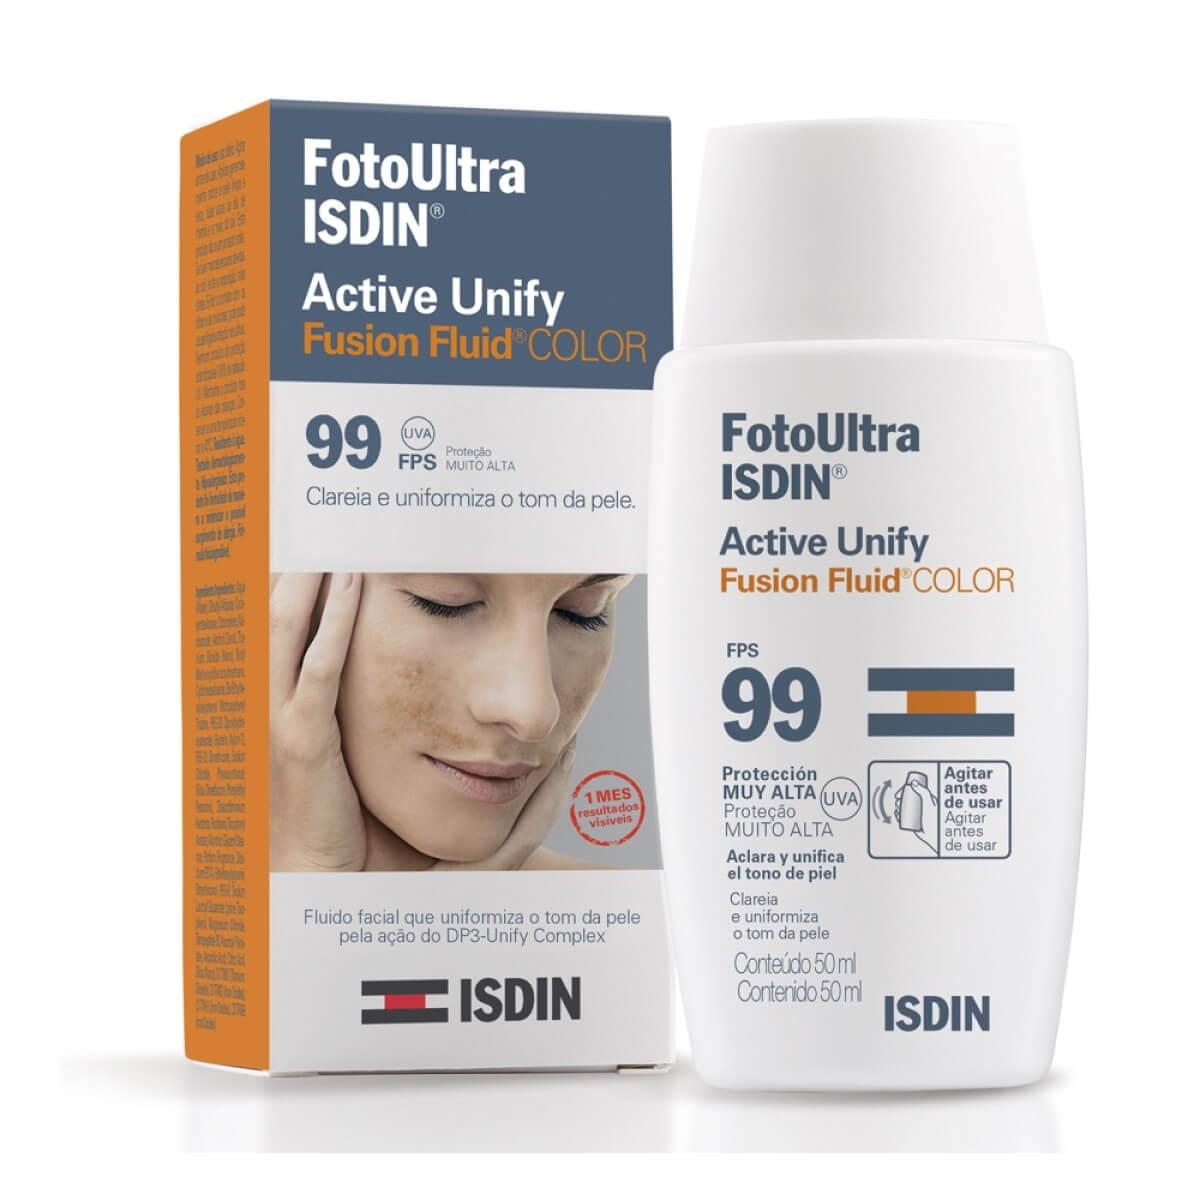 Clareador Facial Isdin FotoUltra Active Unify Fusion Fluid Color FPS 99 com 50ml 50ml